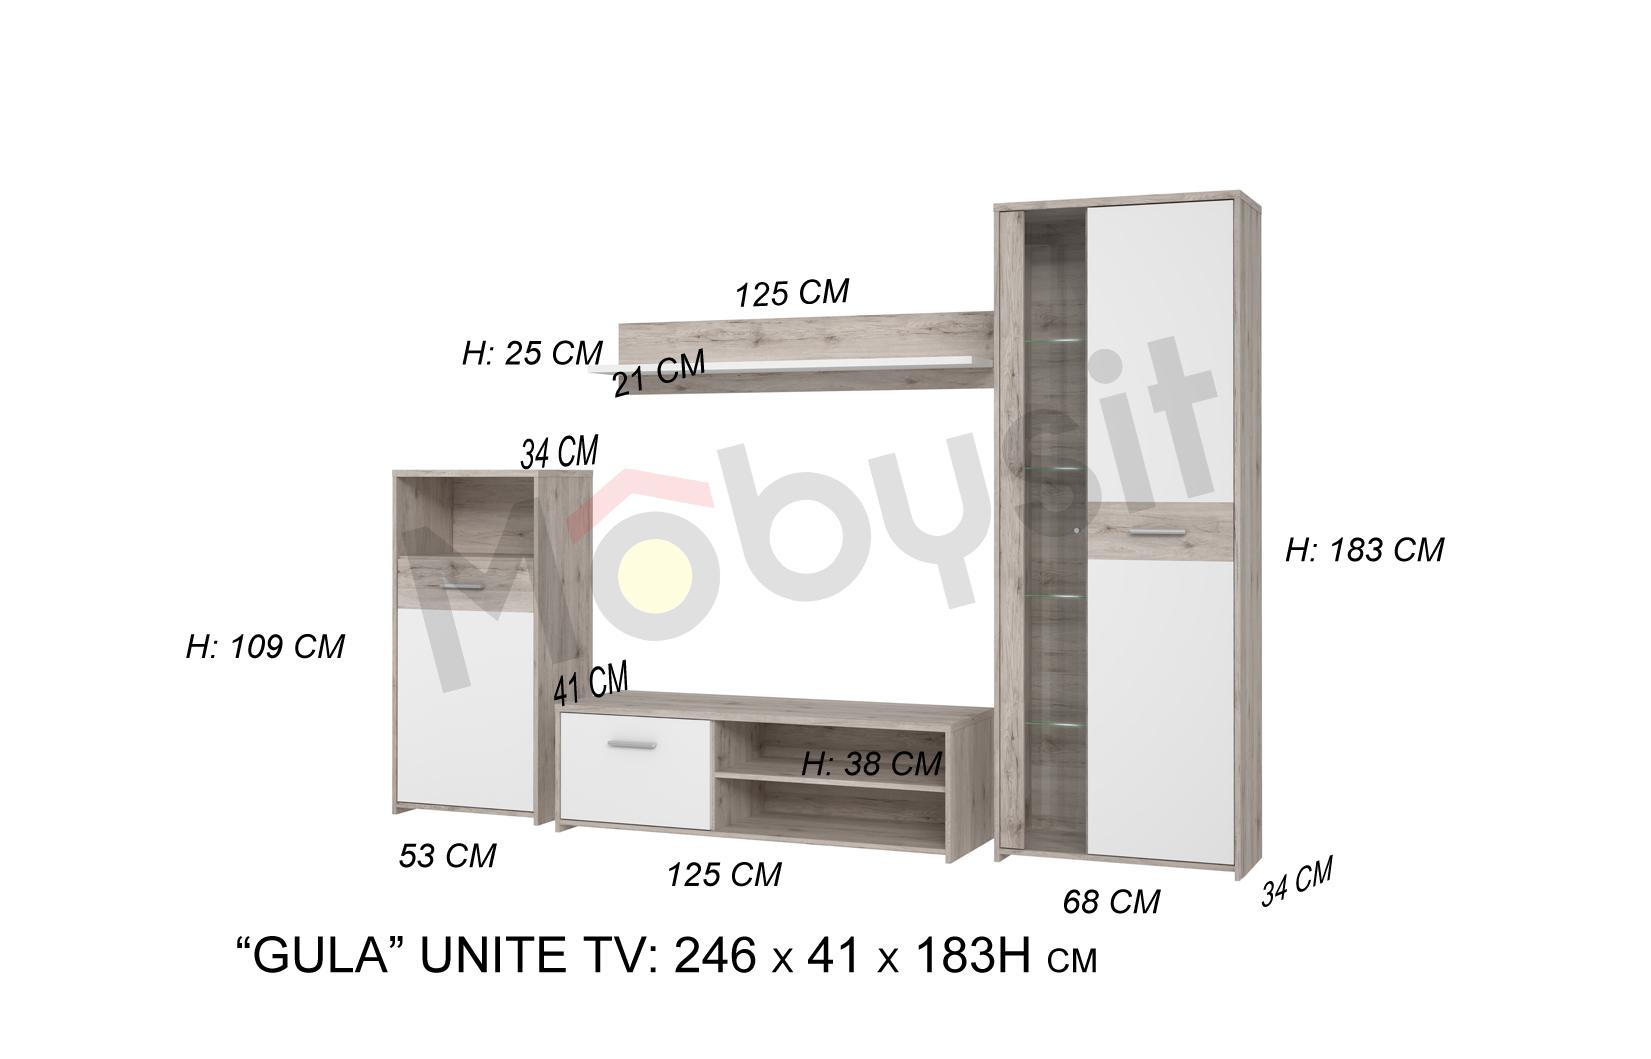 SITE BIG Gulada Tv set dimensions